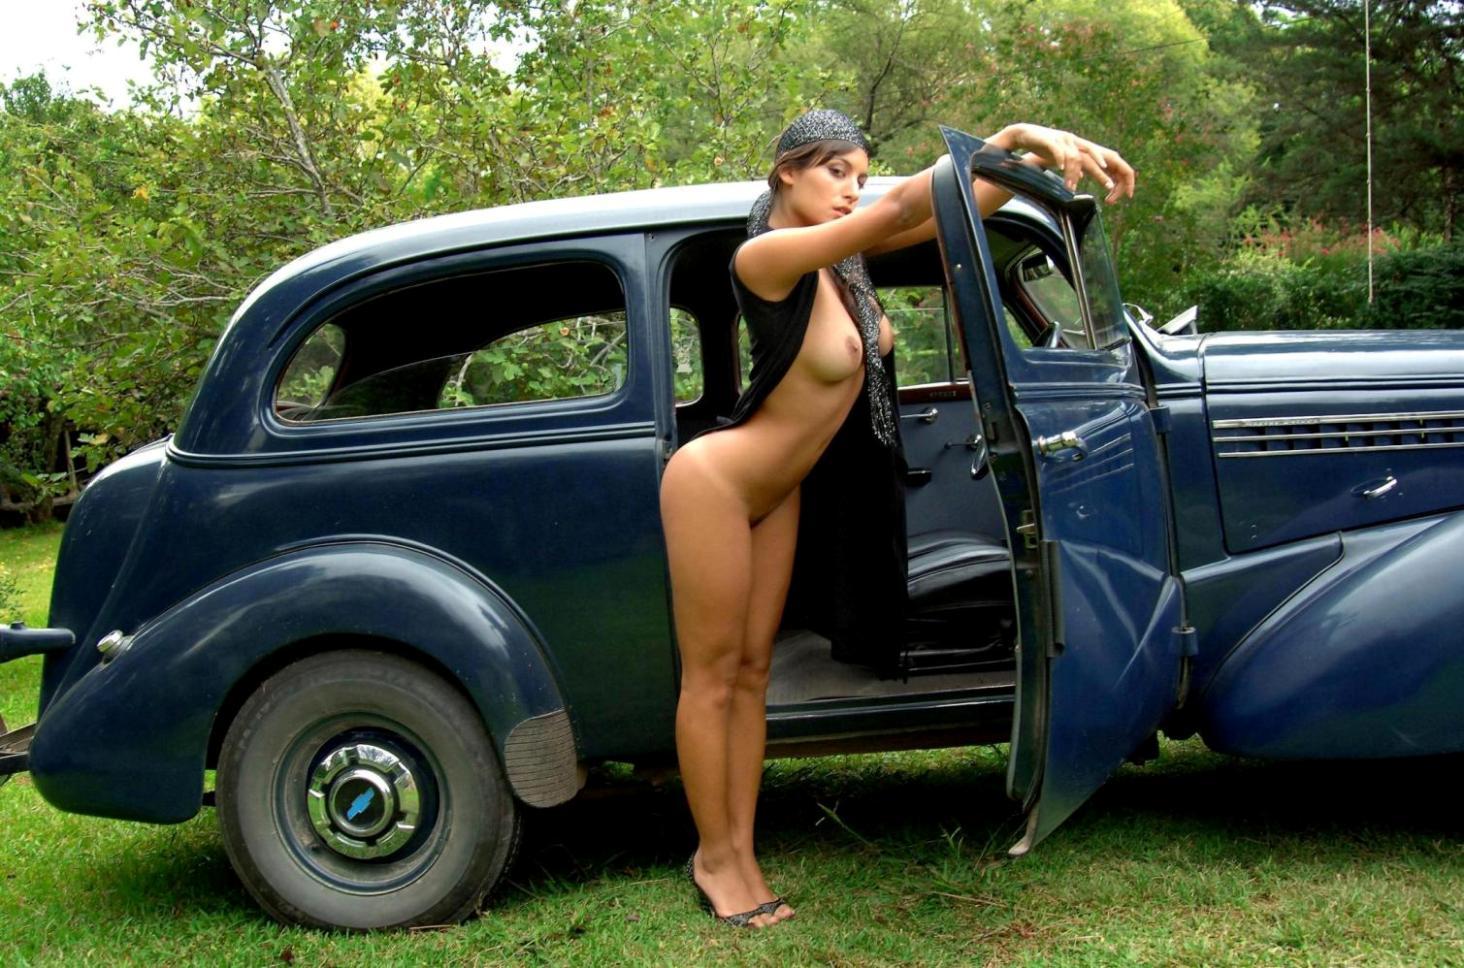 Фото голой девушки на авто 3 фотография